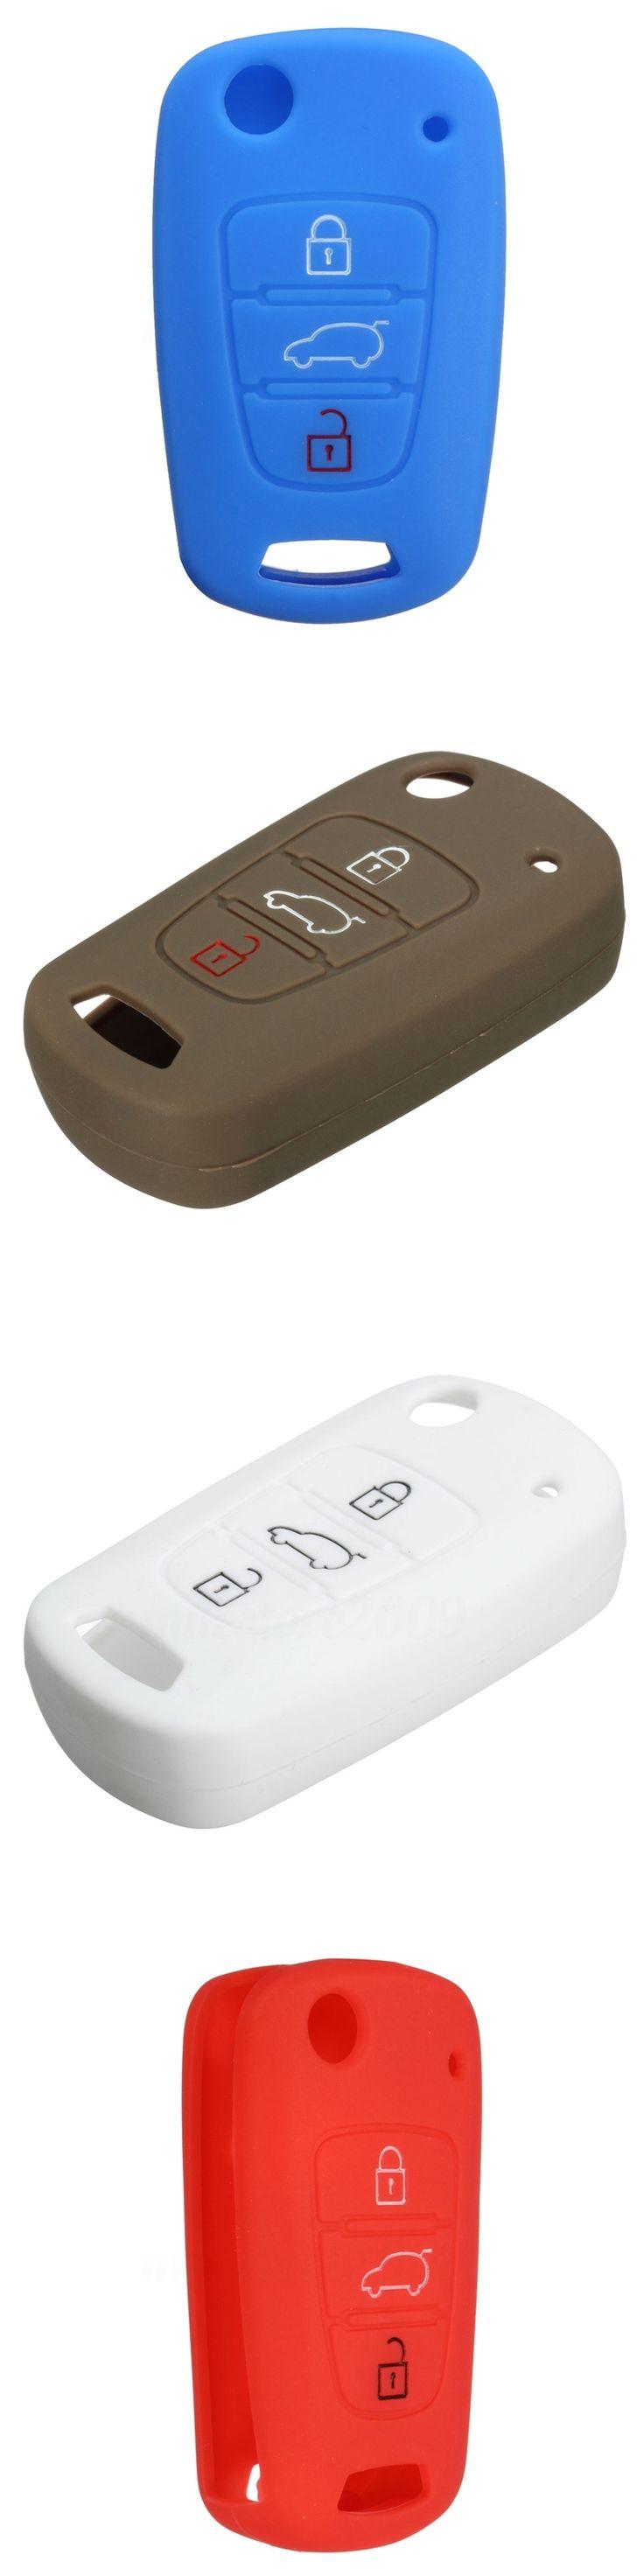 7 Colors Silicone 3 Buttons Remote Flip Key Fob Case For Kia Sportage Soul Rio/Pride/K2 Optima/Magentis/Lotze/K5 Car key Cover